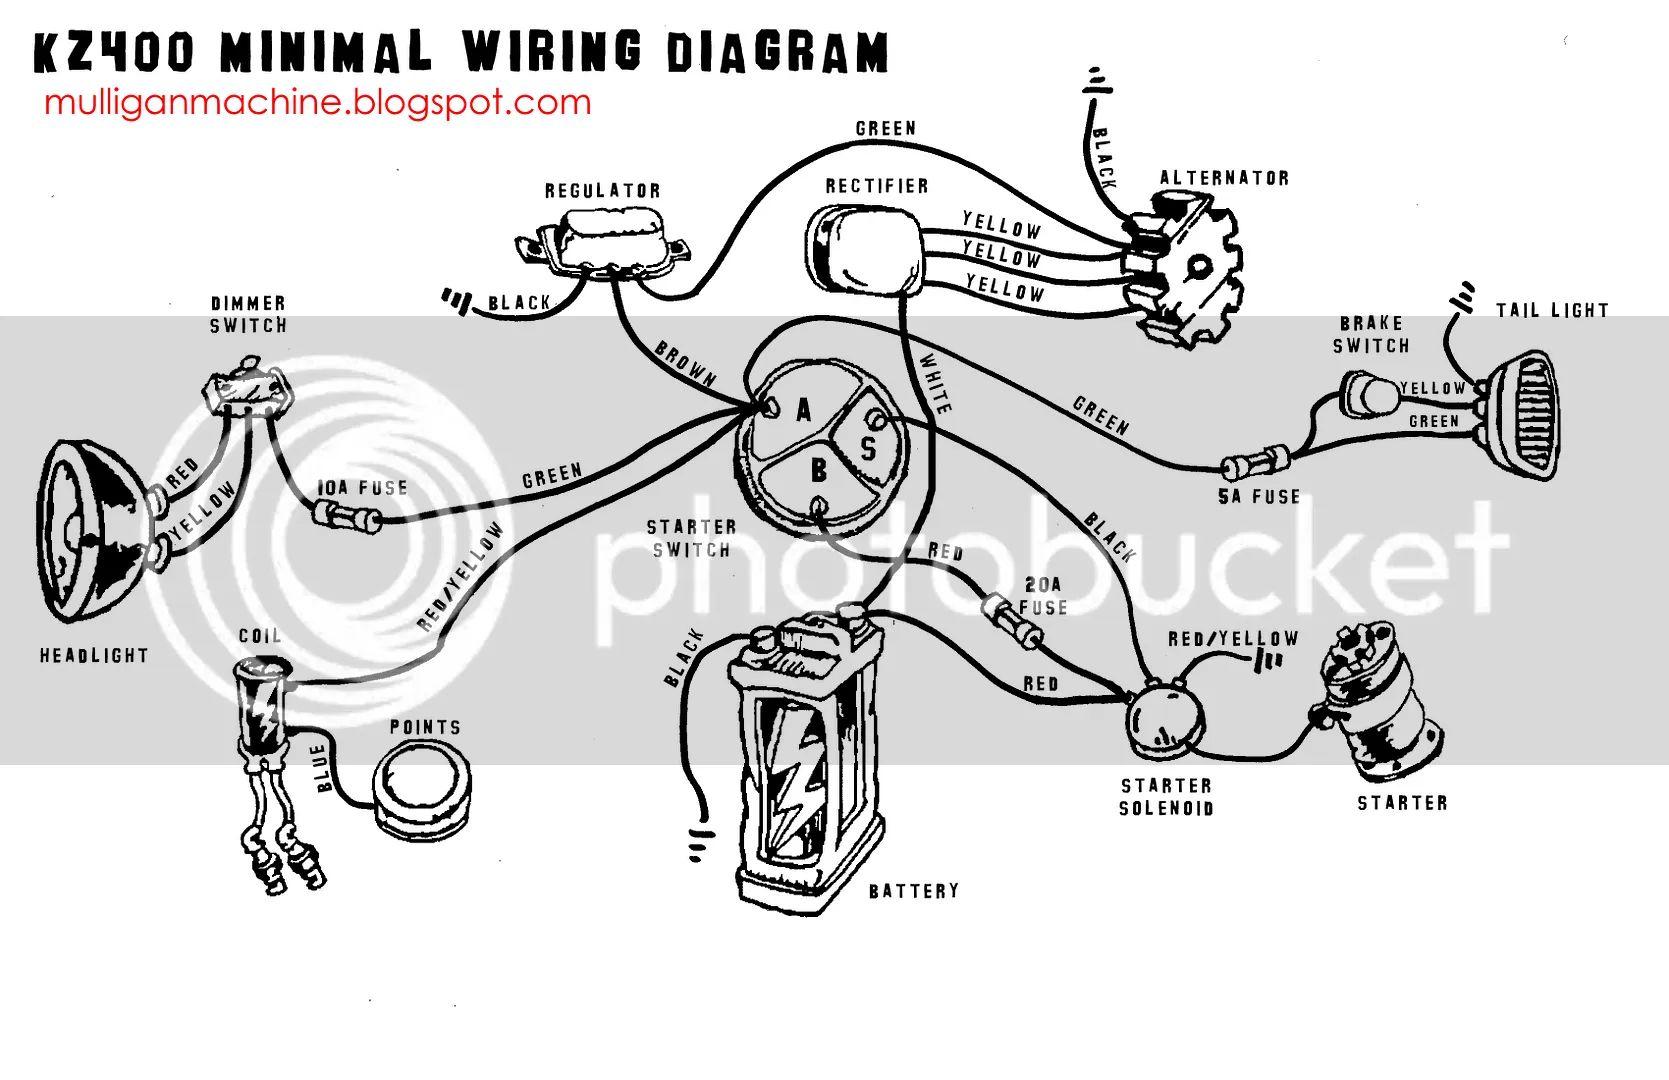 kawasaki zx9r wiring diagram free picture schematic